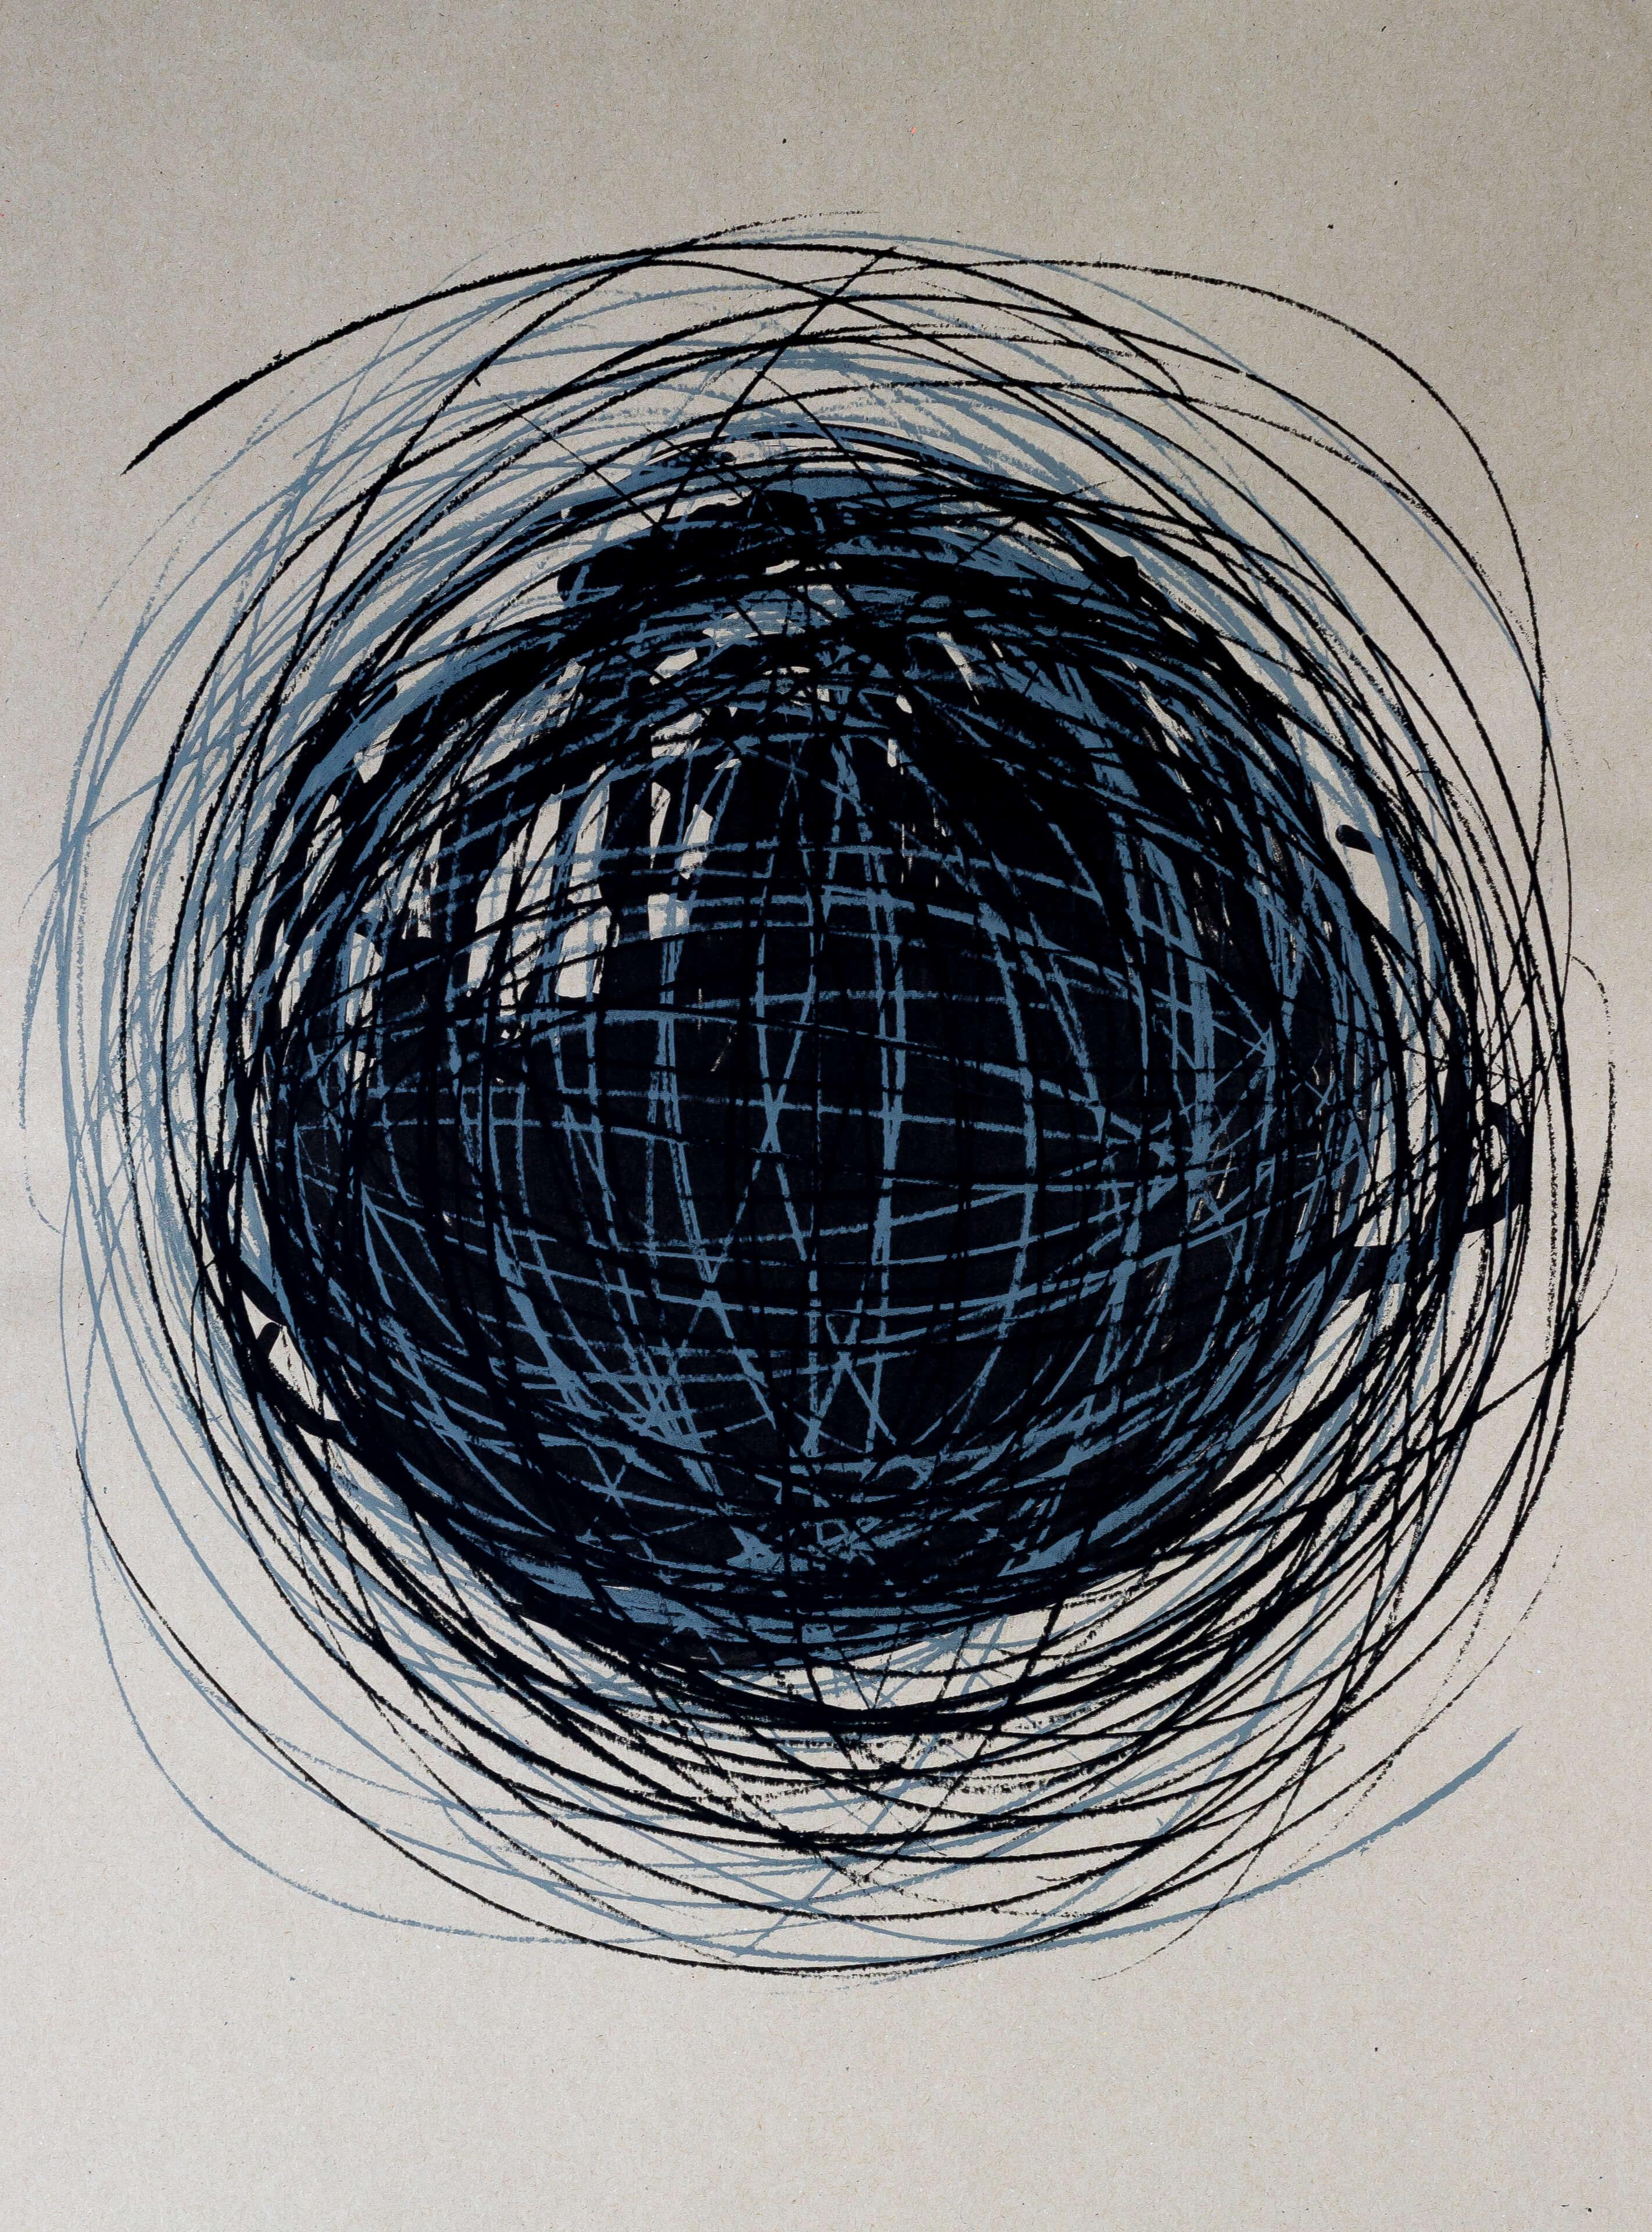 Katharina Albers, Transformation XXXVII, 2011, Siebdruck, Unikat, 59,5x42cm